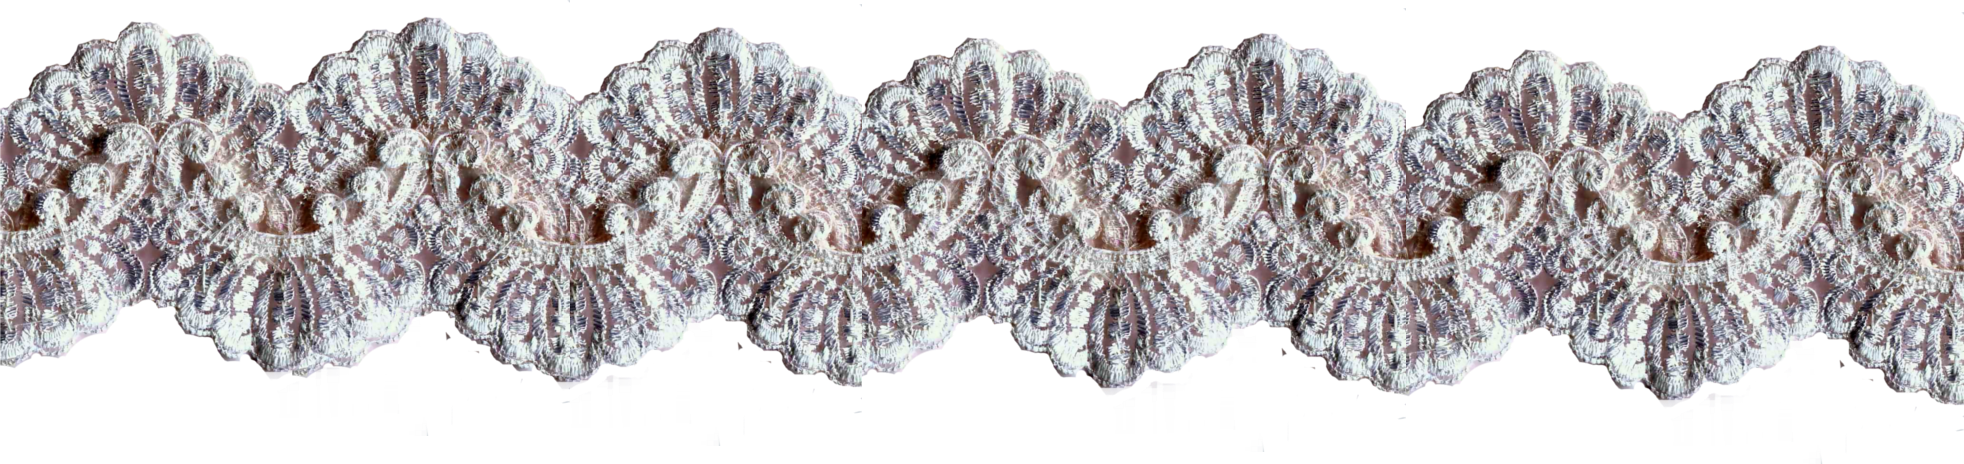 Lace clipart white lace trim. Images of transparent background